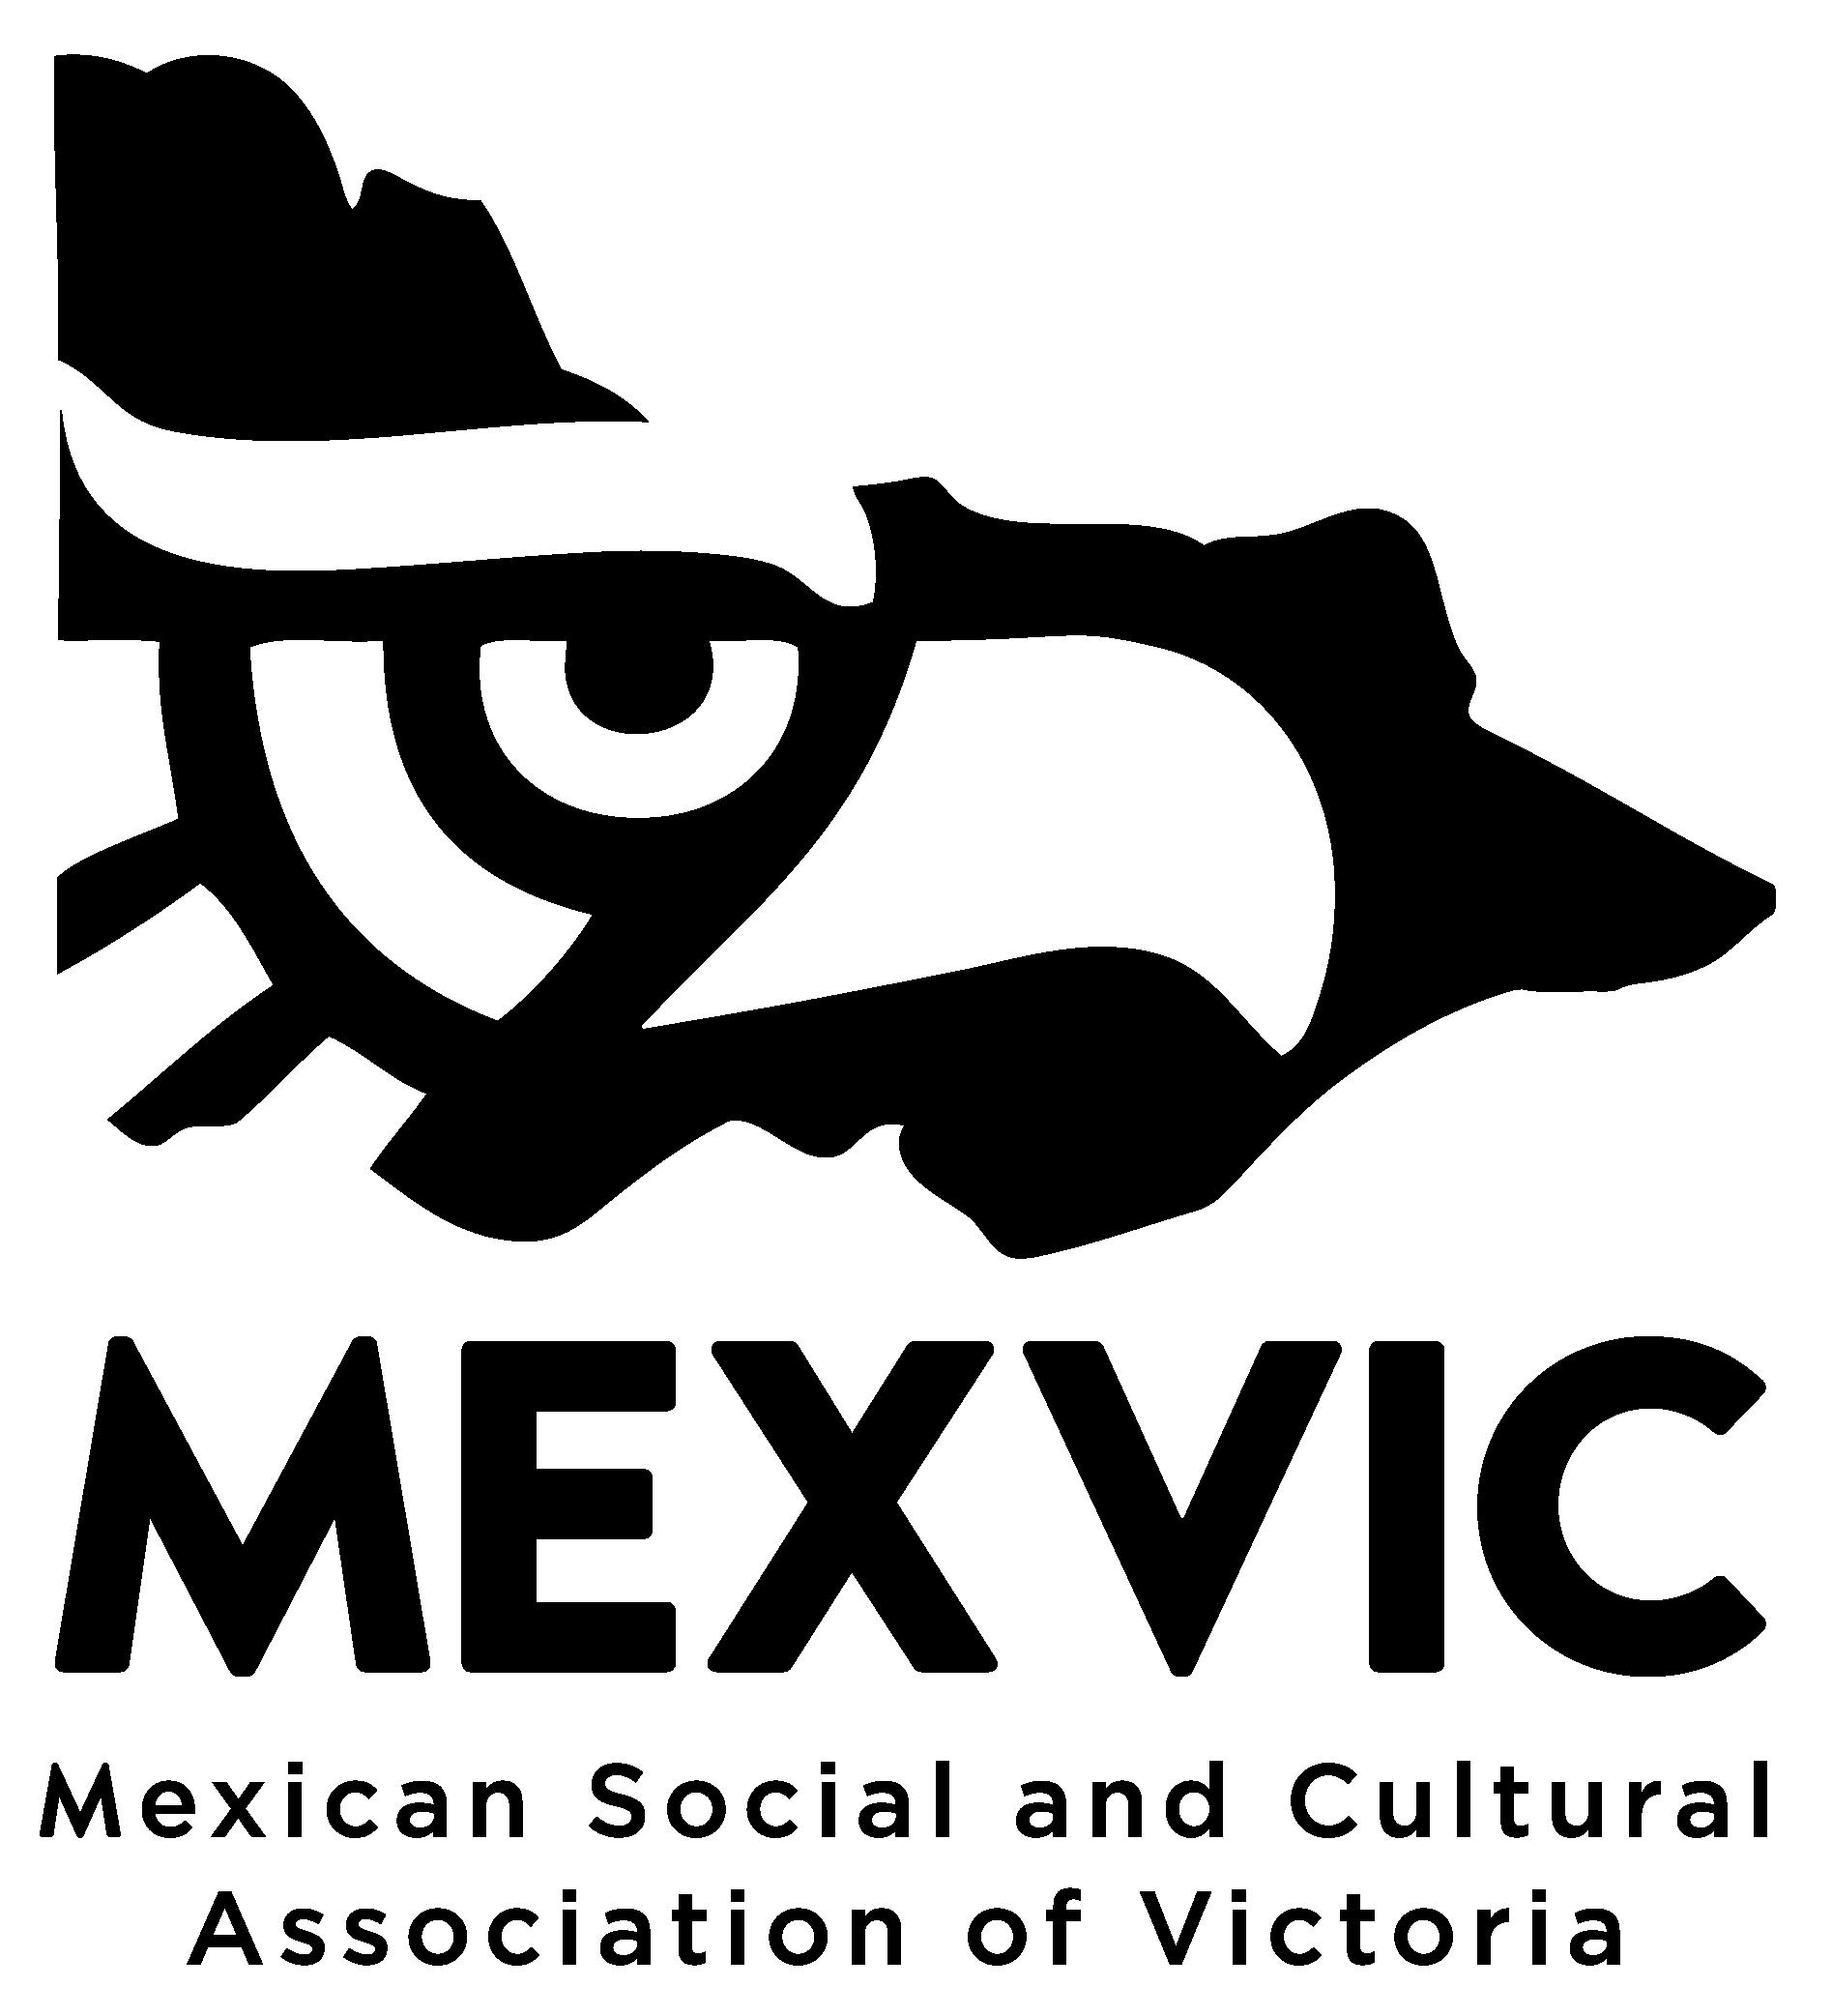 Mexvic_NEWlogo_vertical_black.png